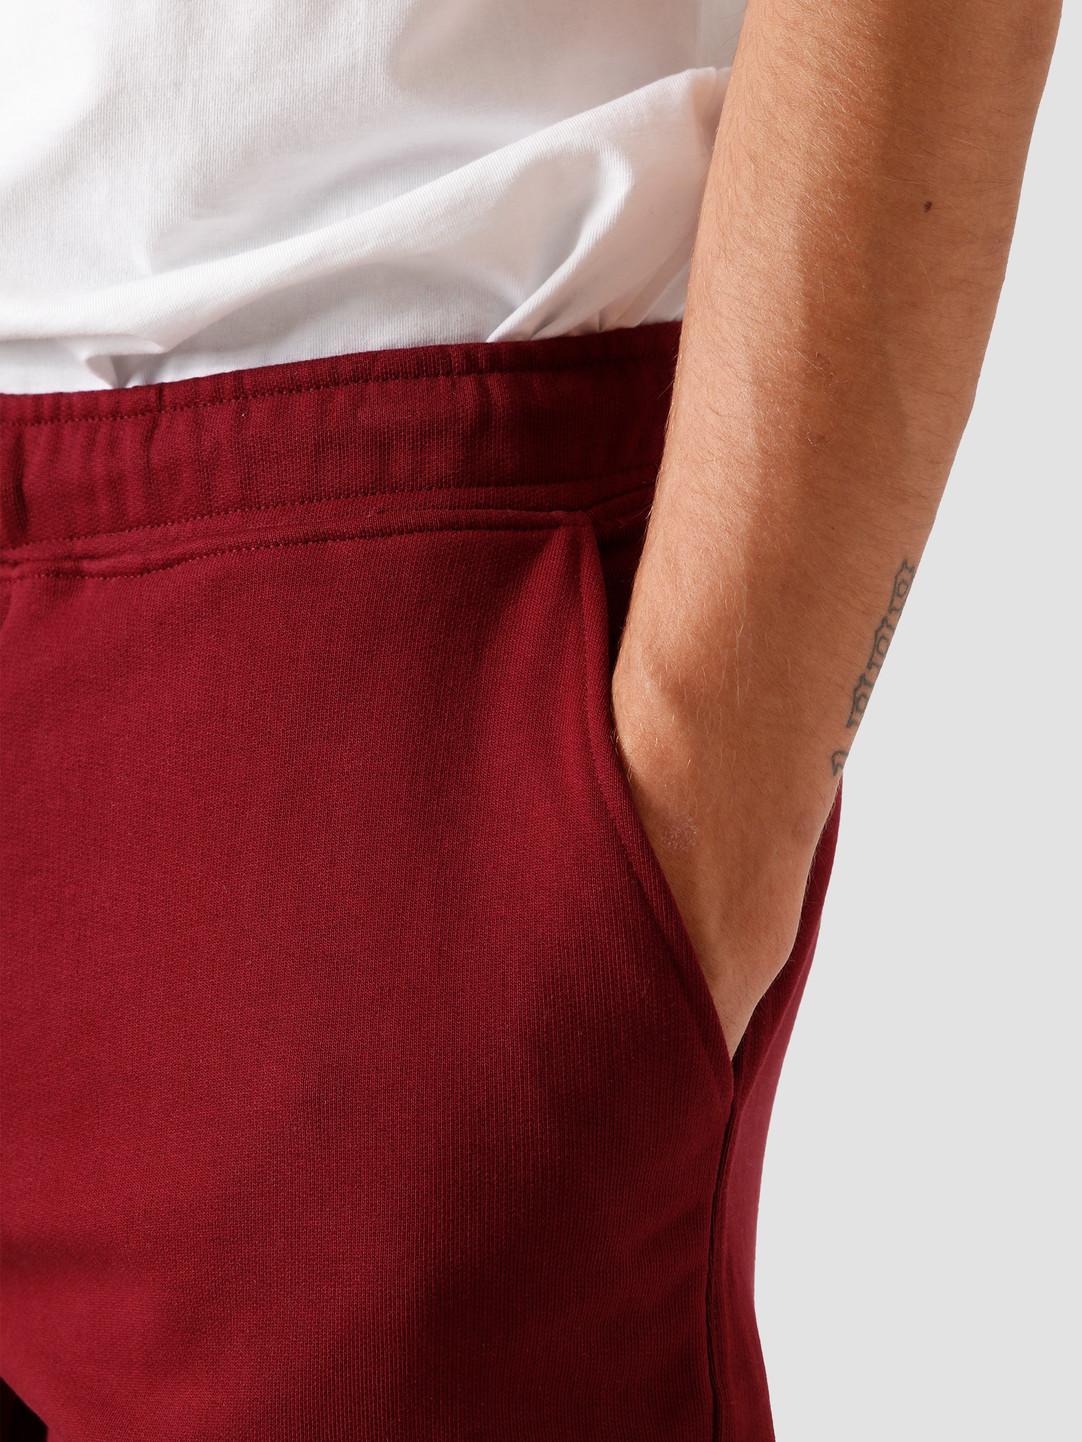 Quality Blanks Quality Blanks QB30 Sweat Short Burgundy Red